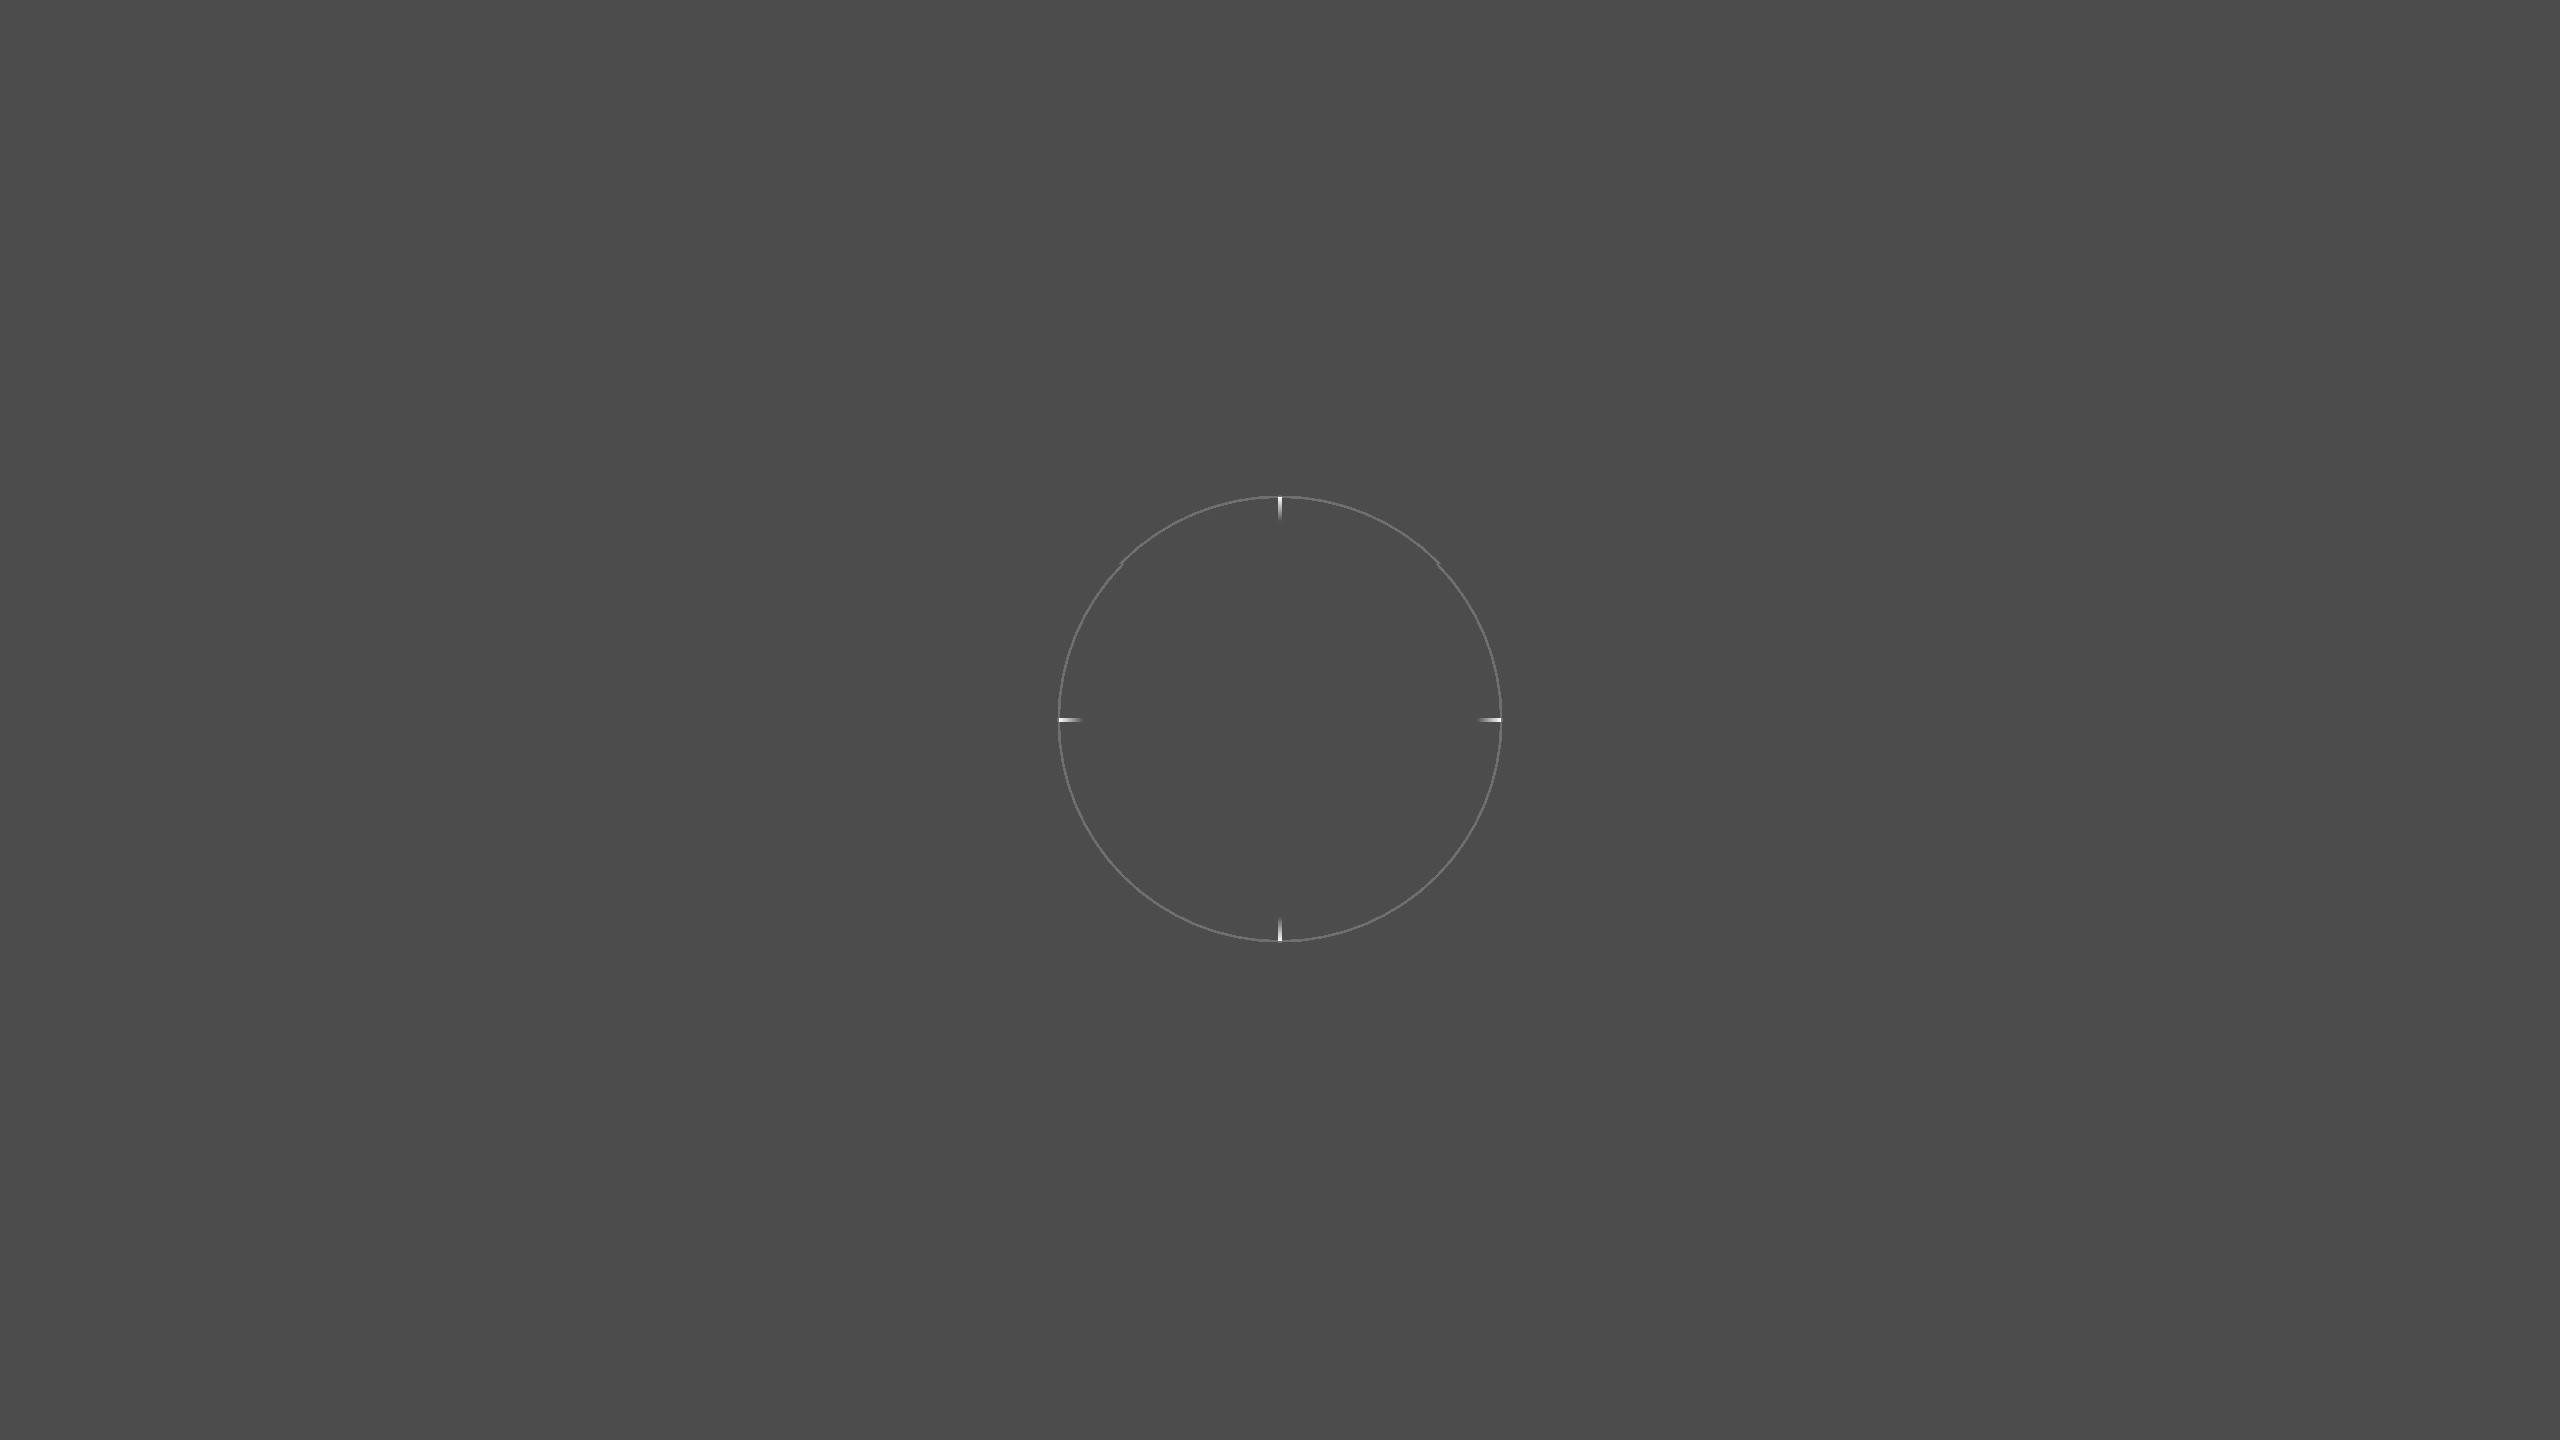 Godot Procedural Crosshair WIP GIFs